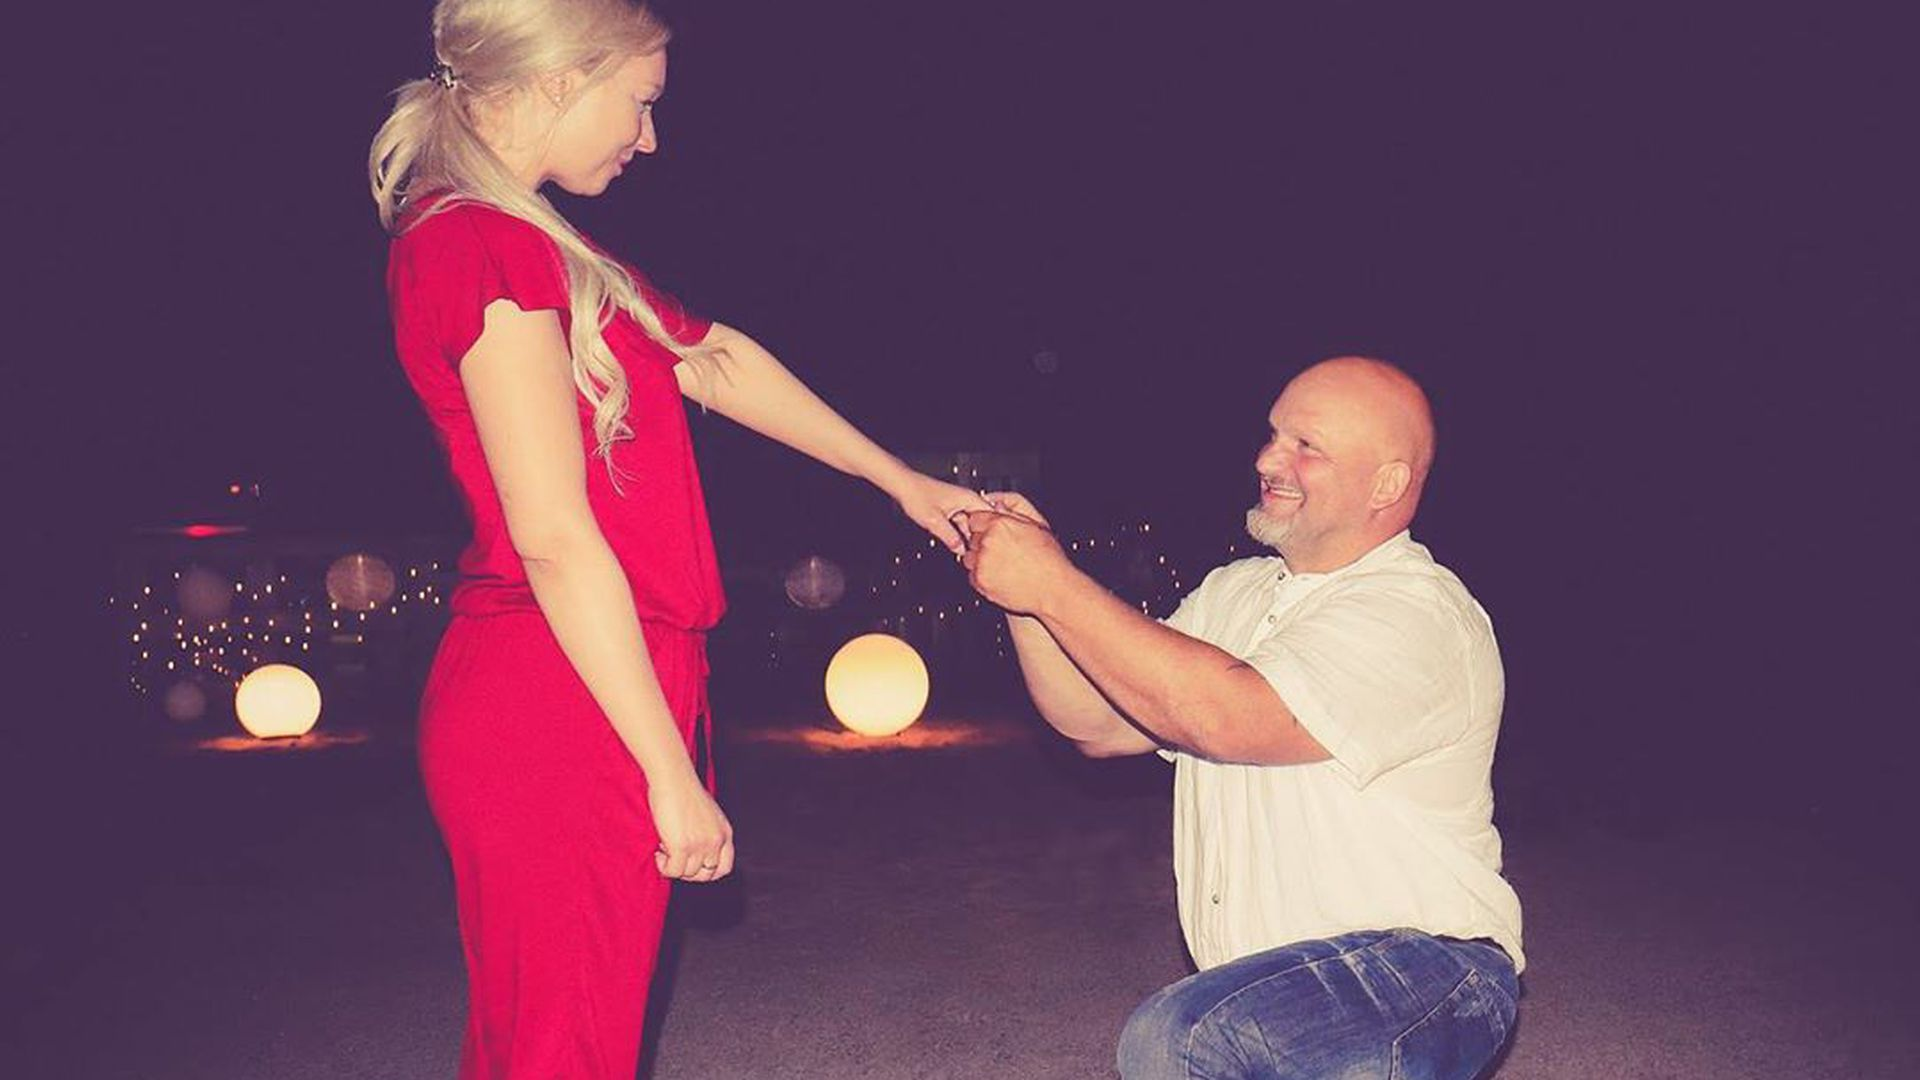 Berlin Tag Nacht Antrag Peggy Joe Heiraten Wieder Promiflash De